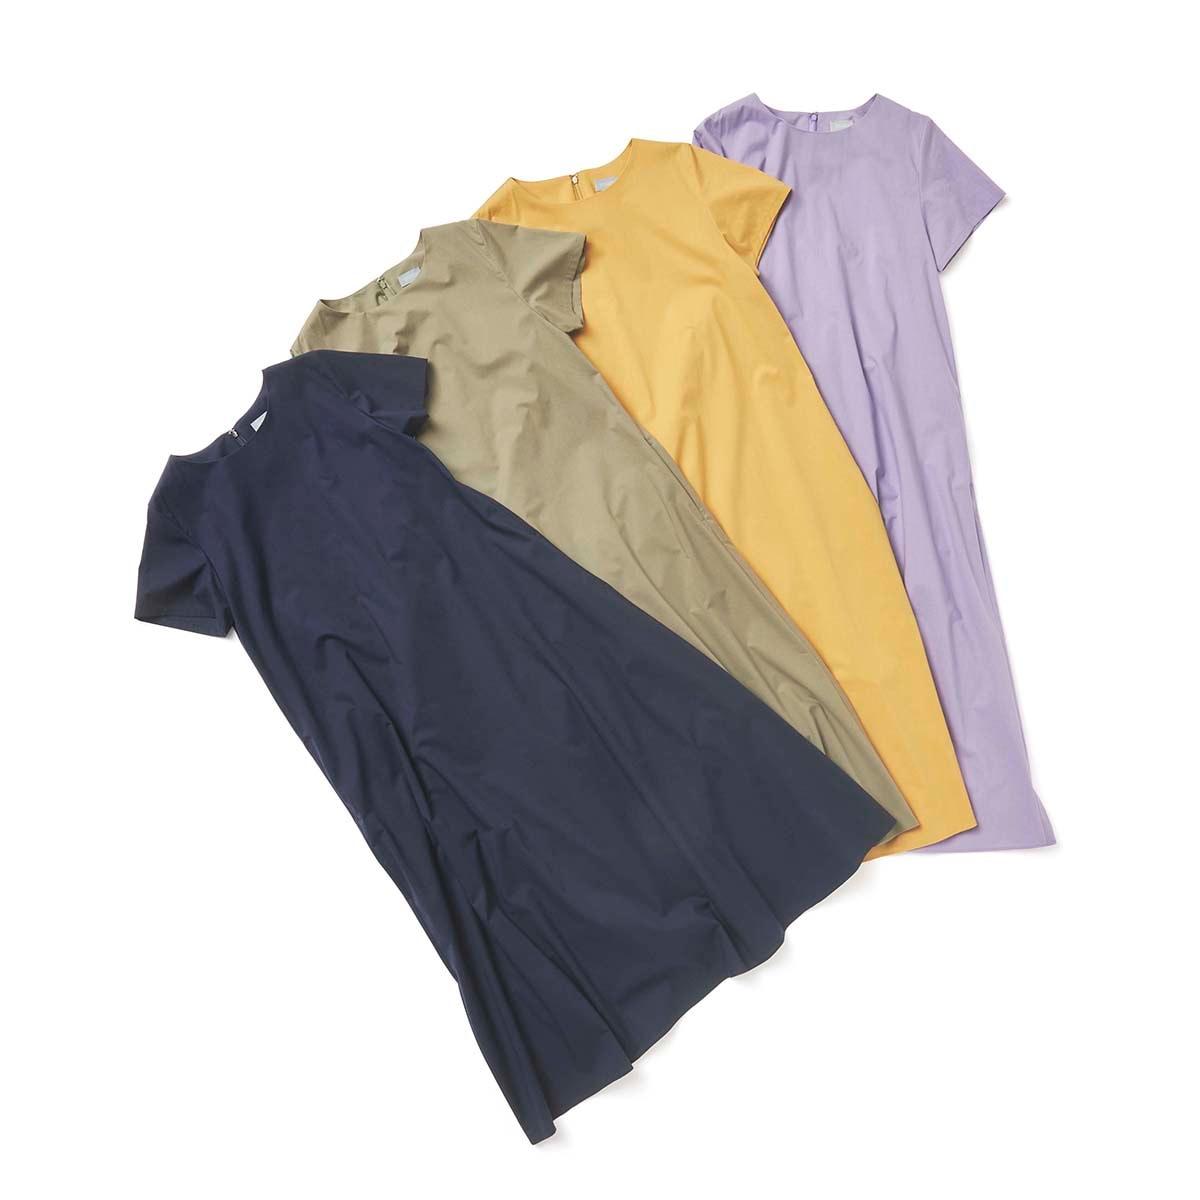 TENT LINE DRESS